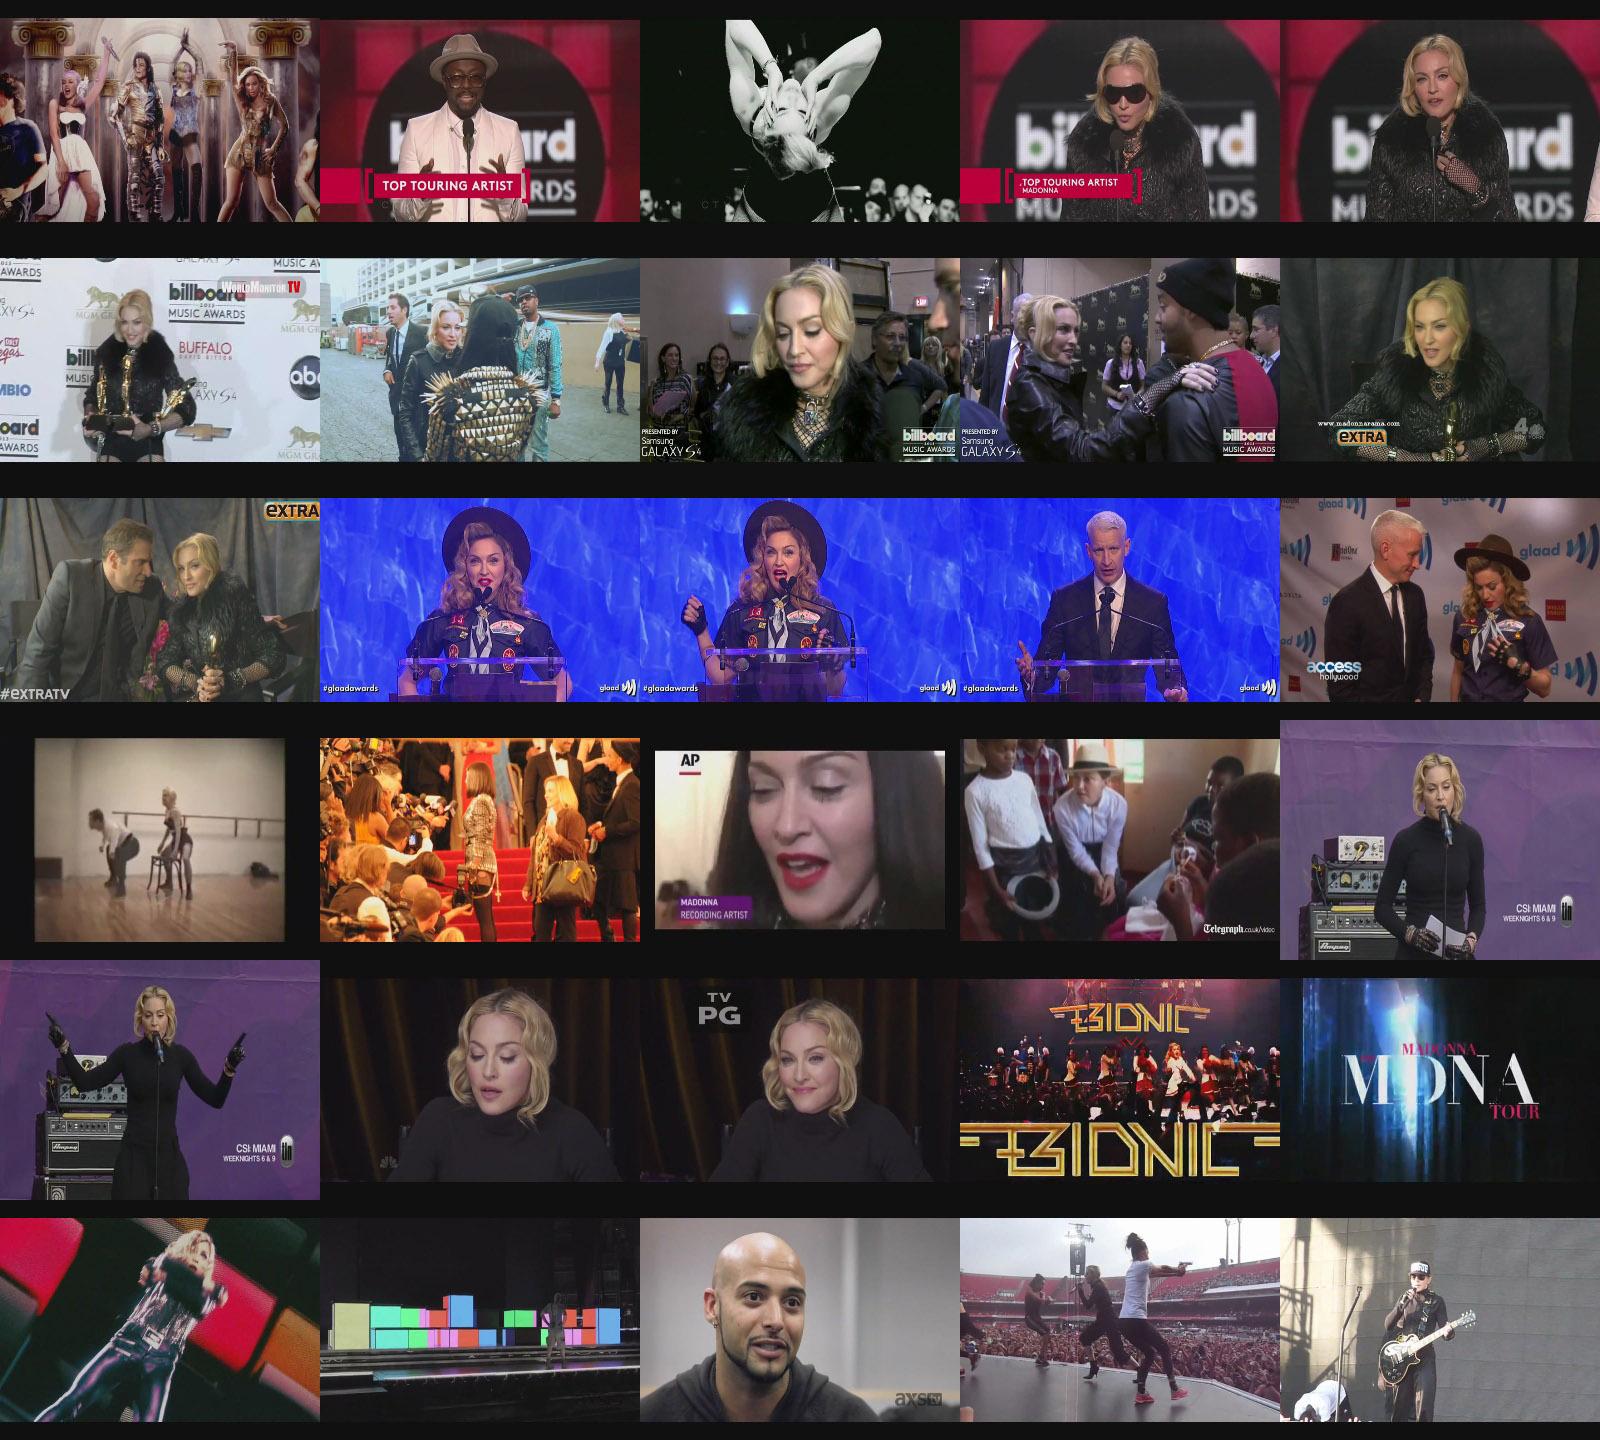 madonna-dvd-2013-billboard-awards-glaad awards-met gala-epix-mdna-bakcstage-mdna-soundcheck-mdna-são-paulo